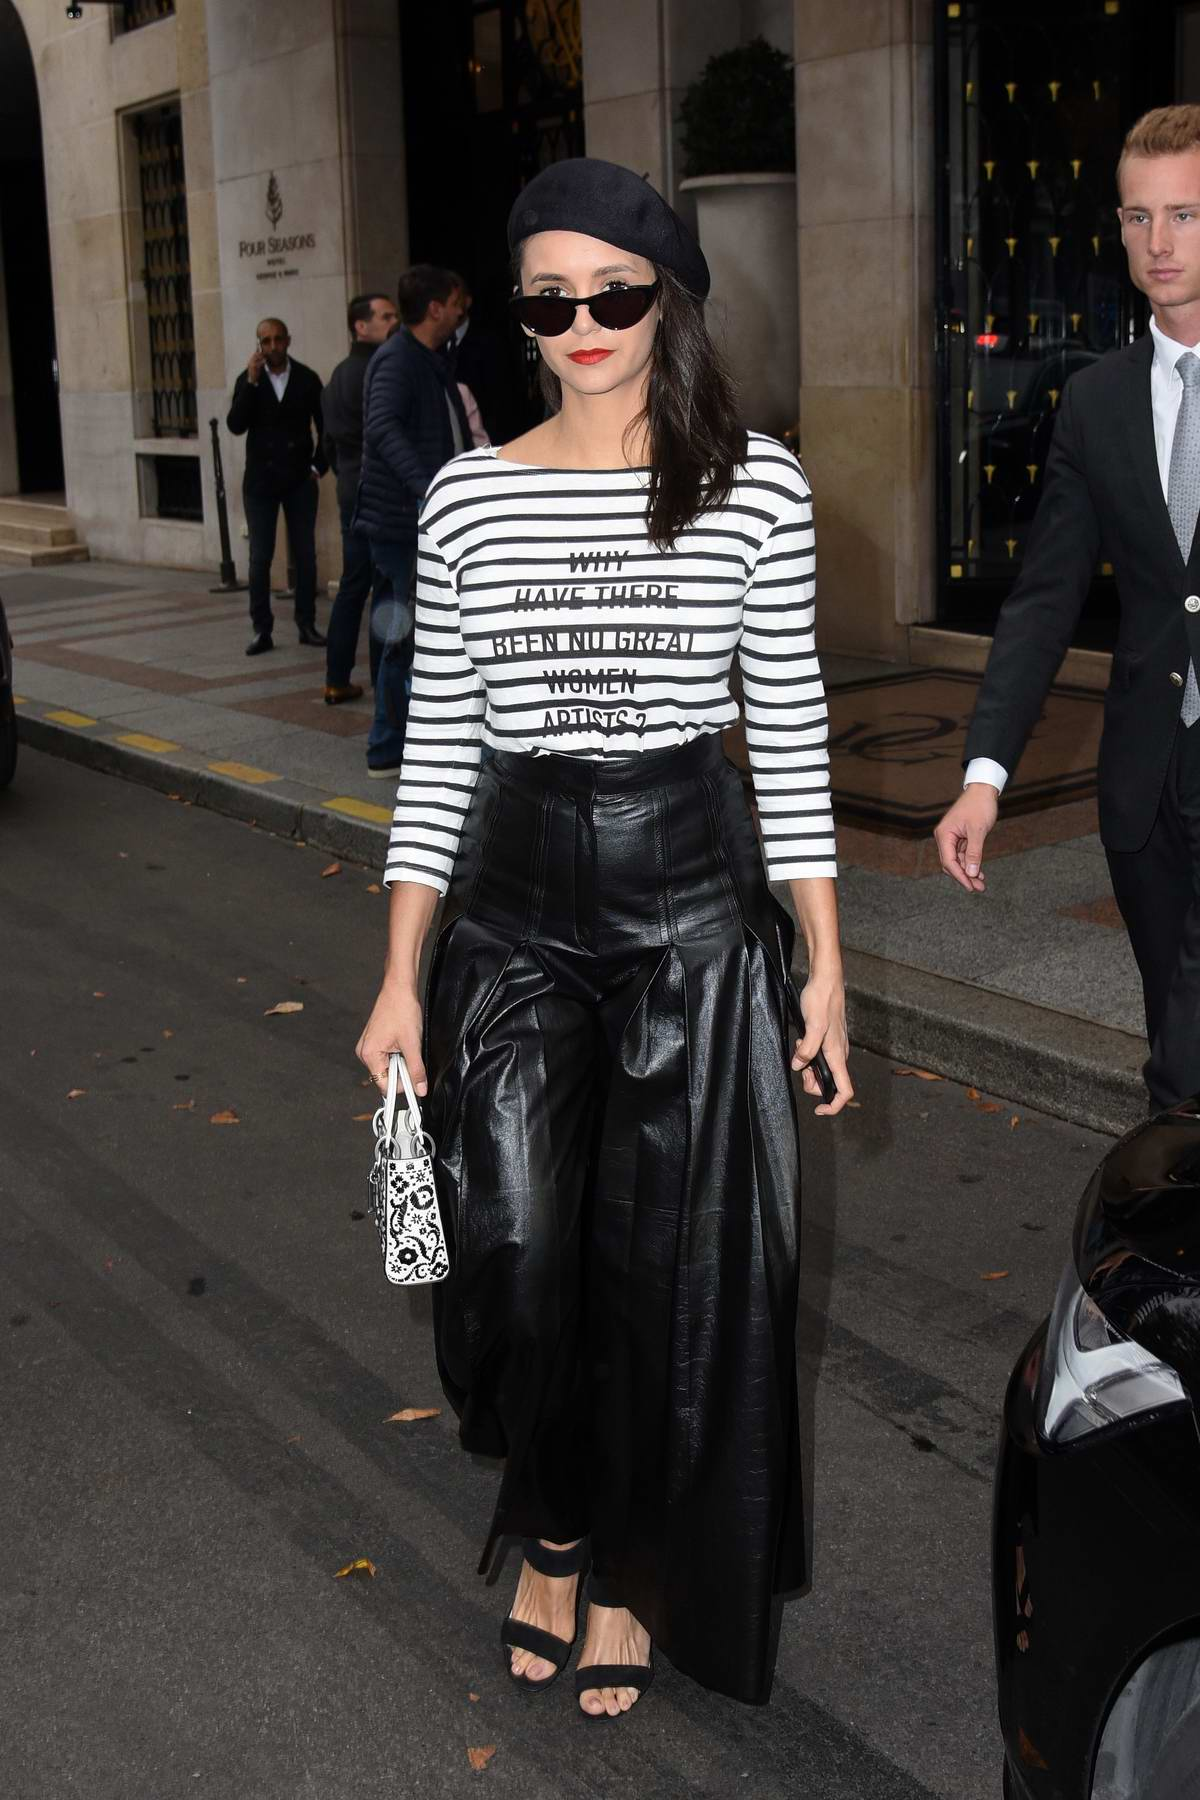 Nina Dobrev looks stylish in black leather skirt as she leaves the George V Hotel in Paris, France